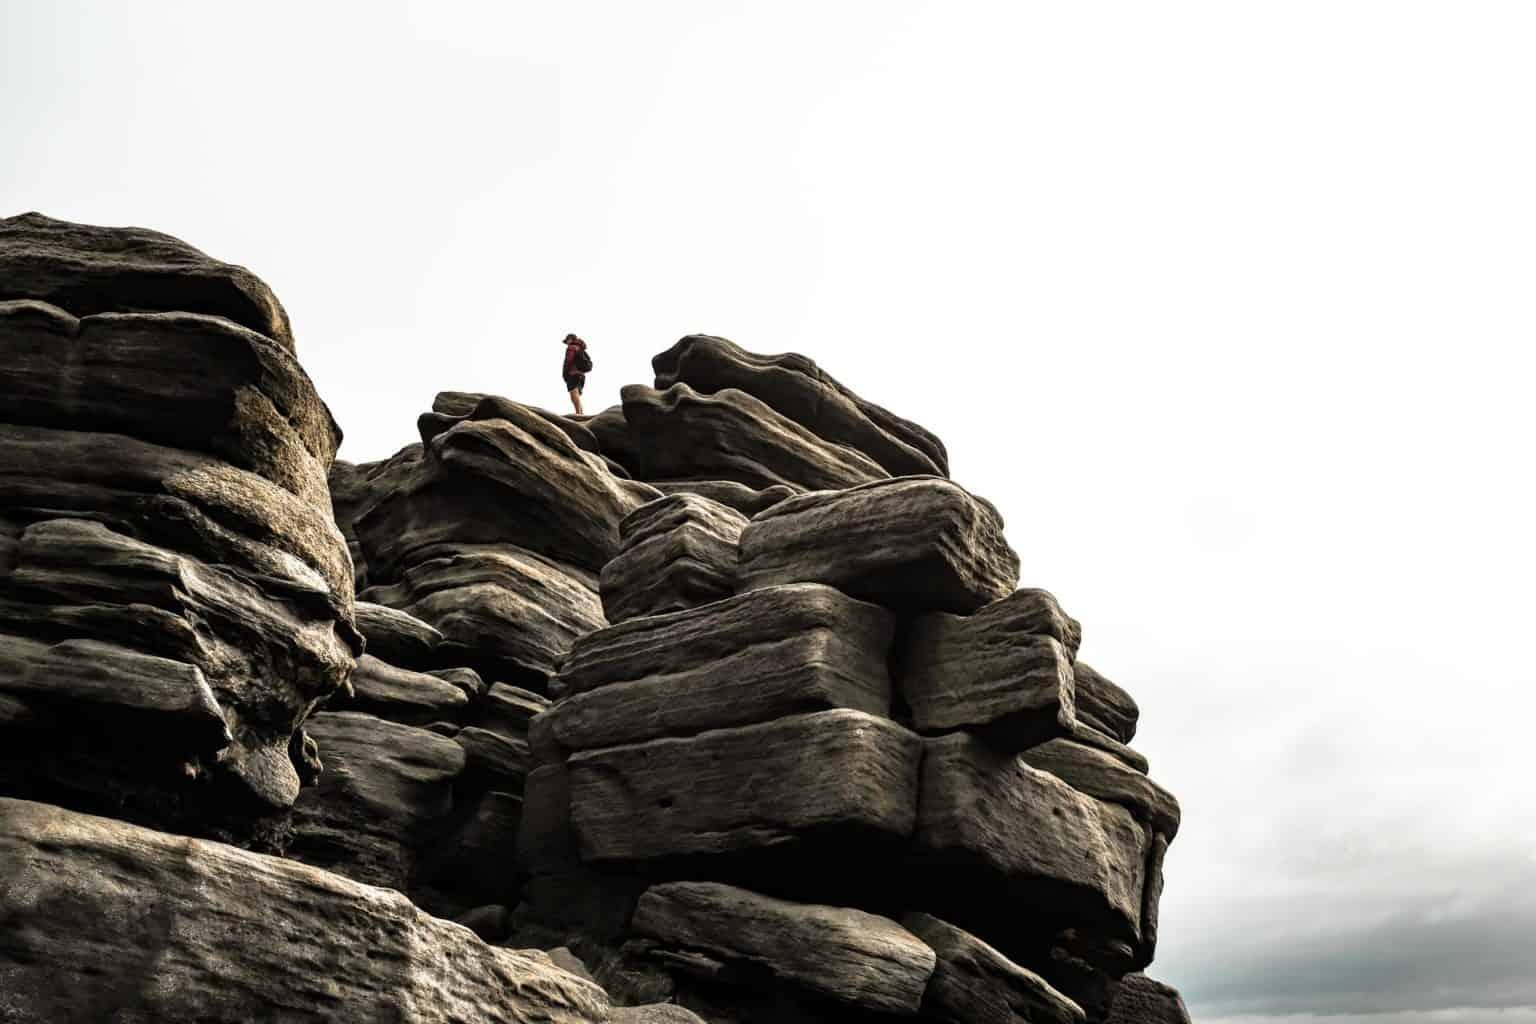 Jacob's Ladder, Pennine Way